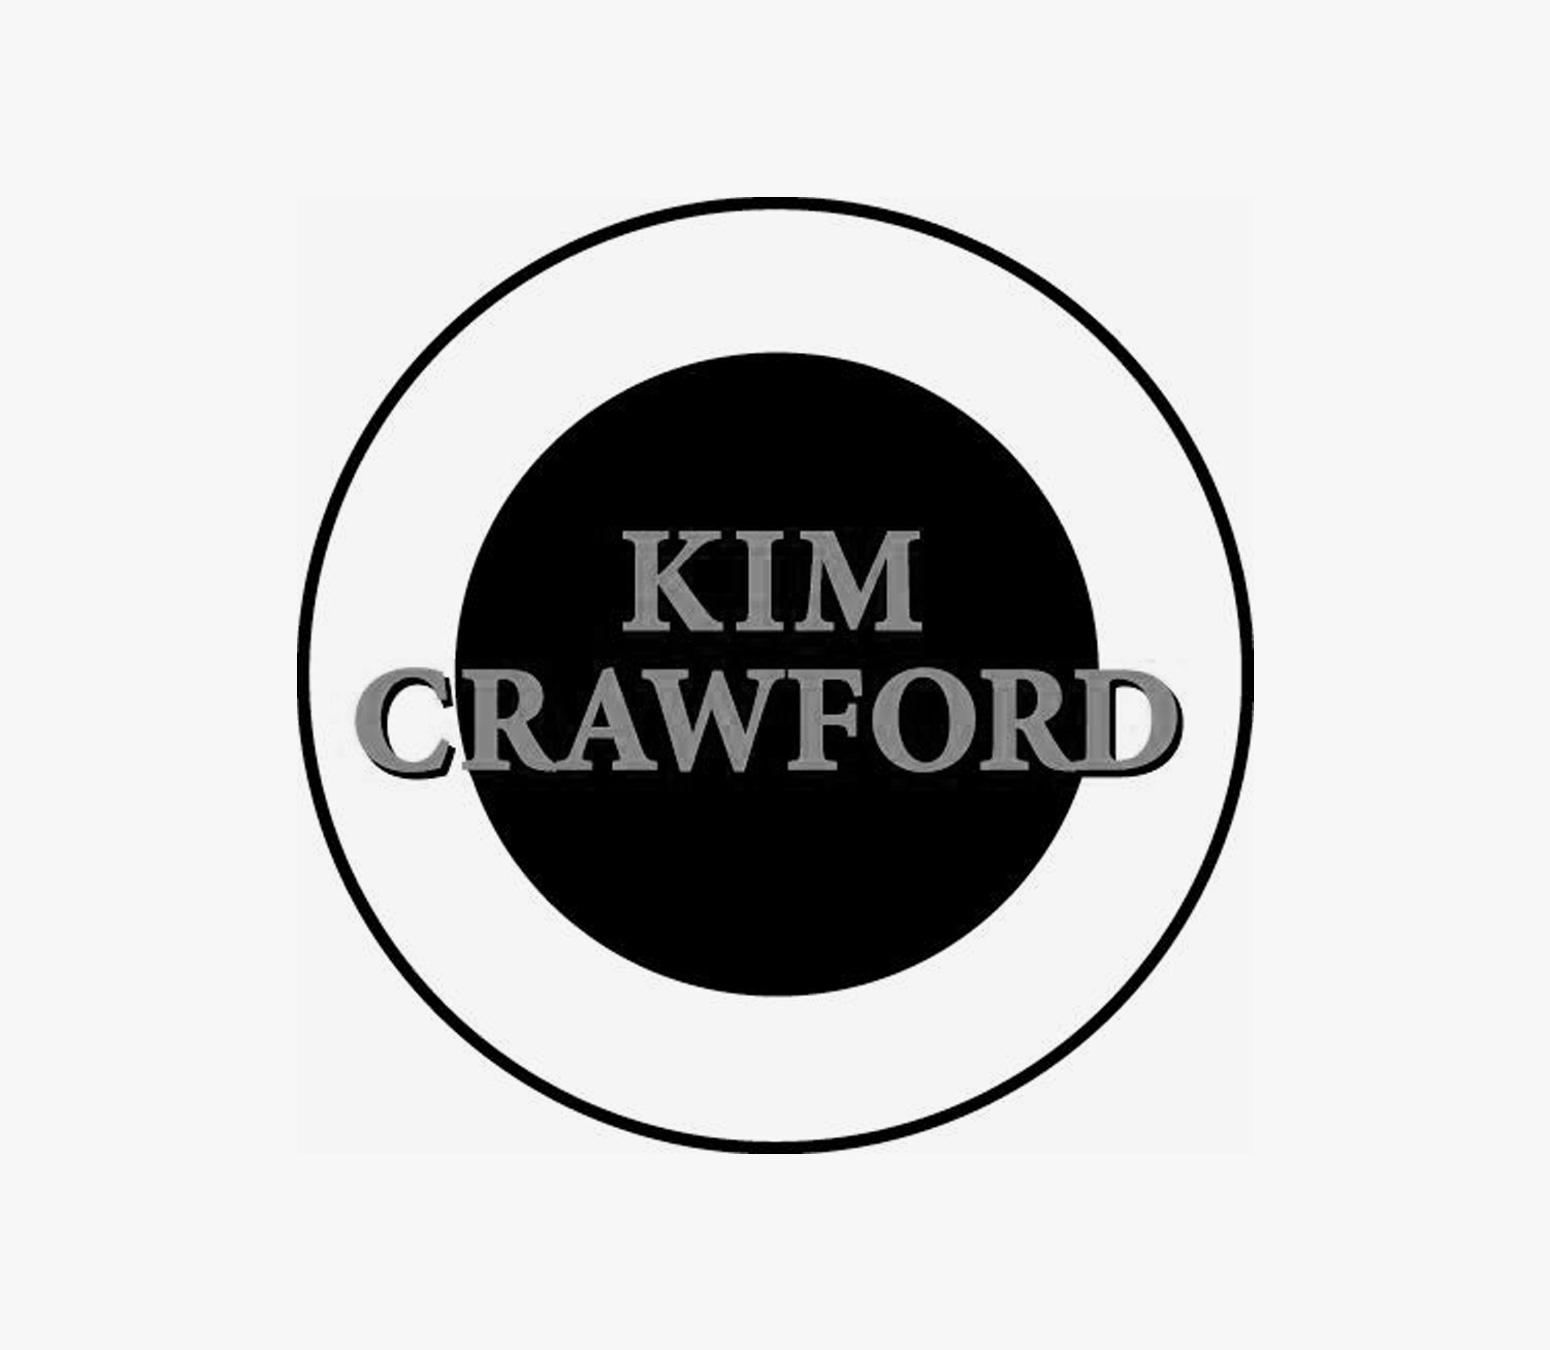 logo-kim-crawford.jpg